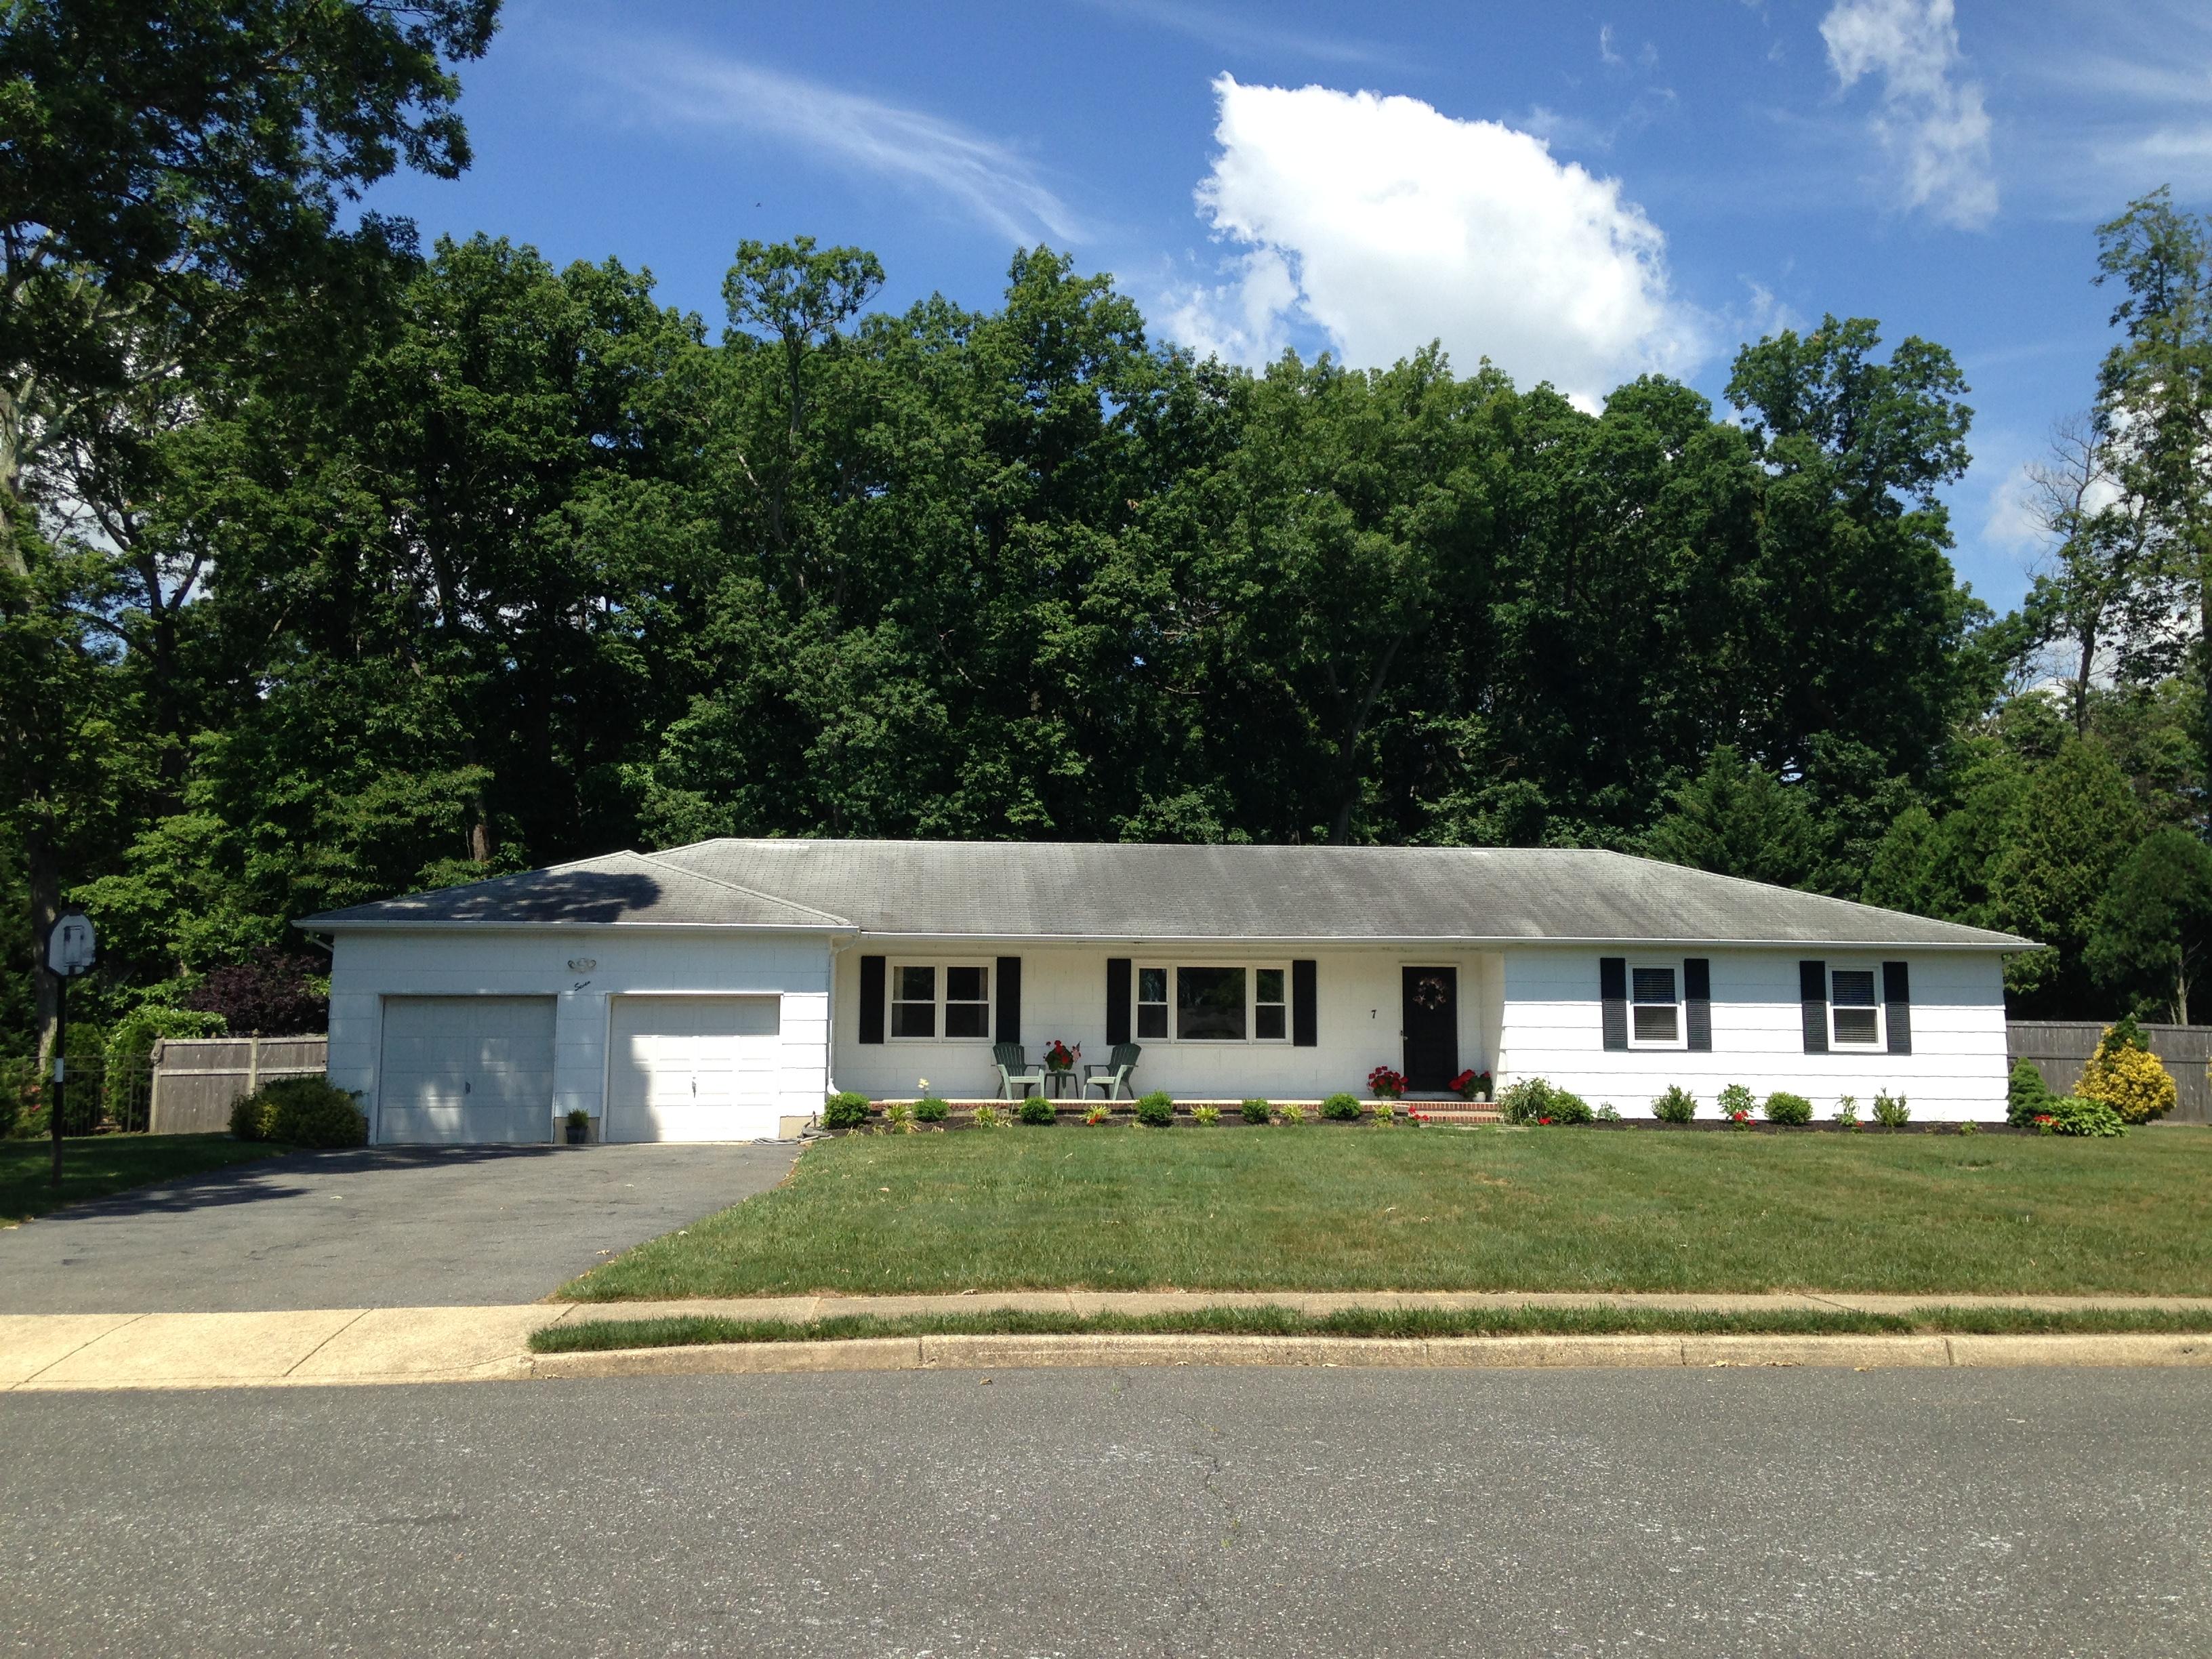 獨棟家庭住宅 為 出售 在 LOCATION, LOCATION, LOCATION... 7 Sharon Drive Ocean, 新澤西州 07712 美國